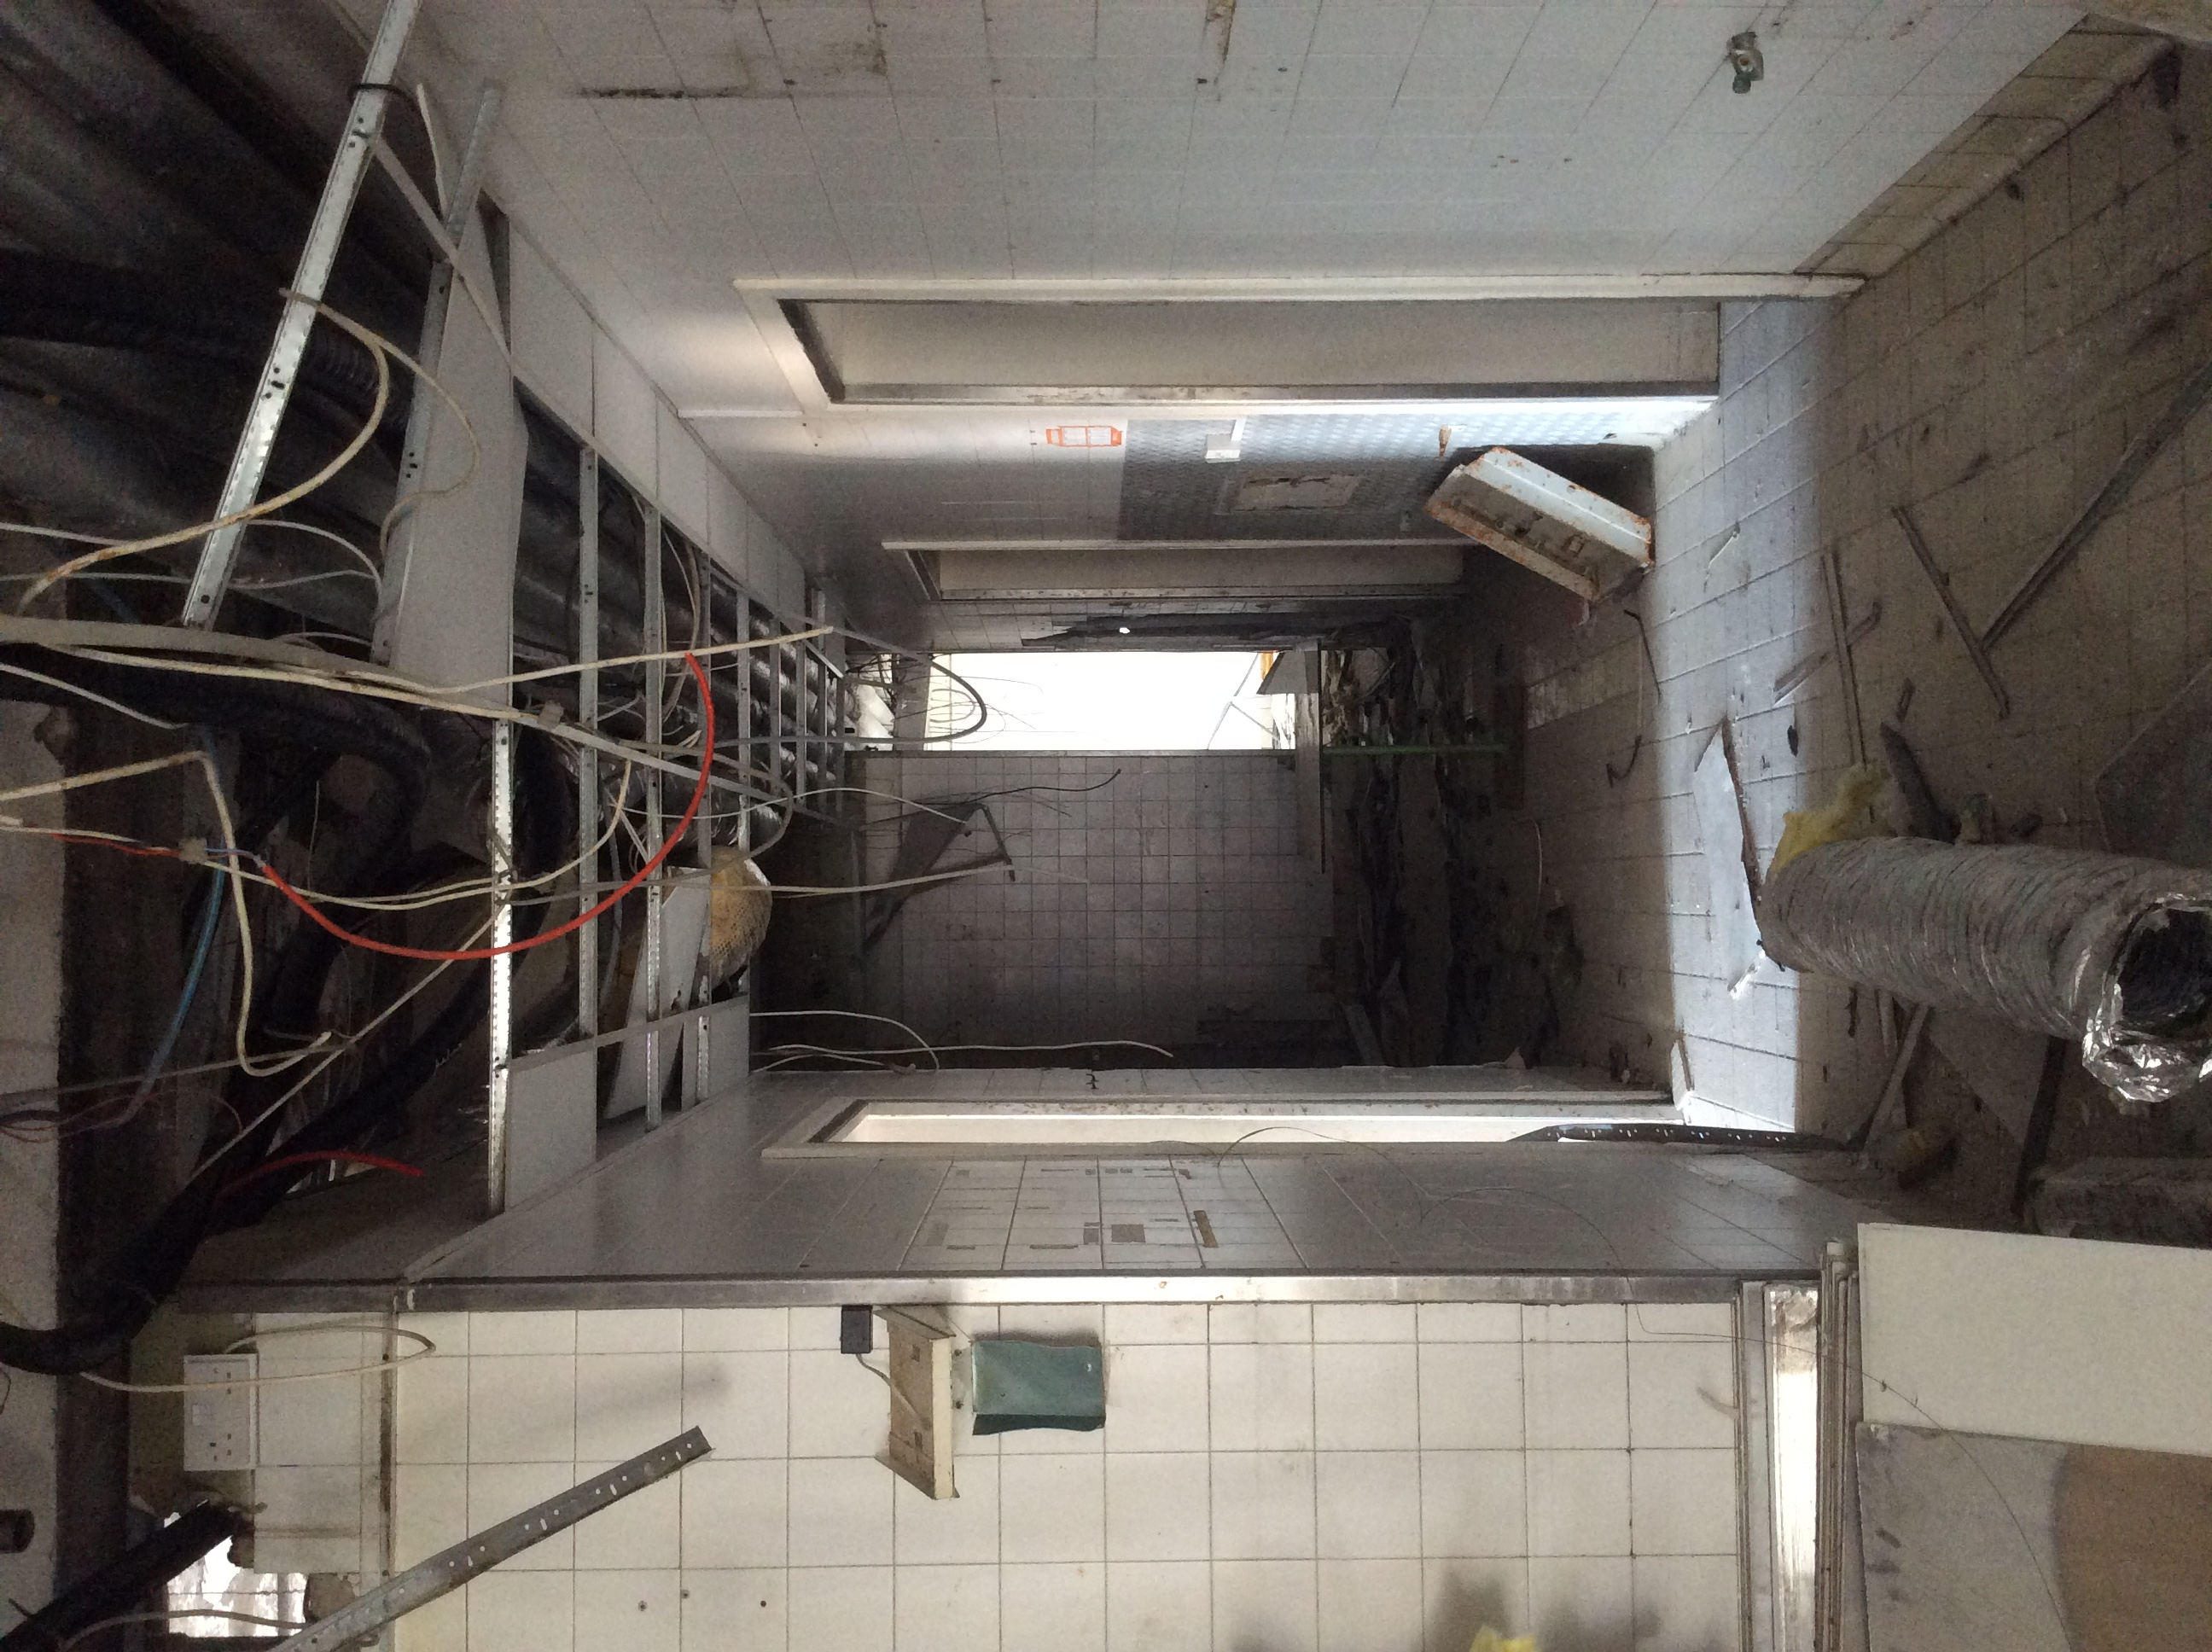 file:formerly hosting a mc donalds restaurant corridor